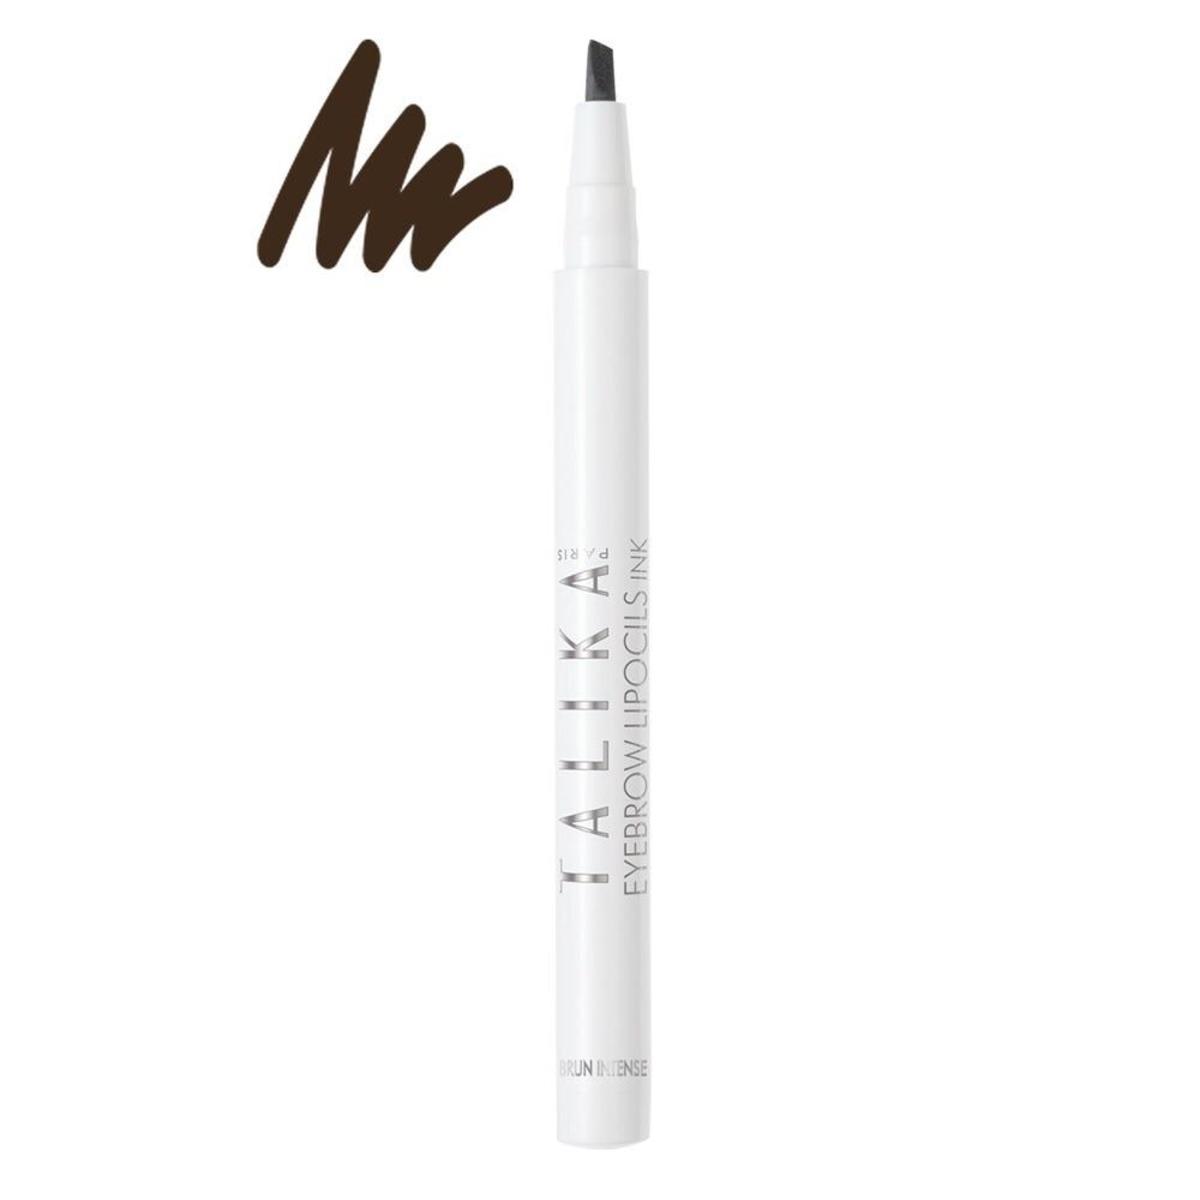 Eyebrow Lipocils Ink Deep Brown